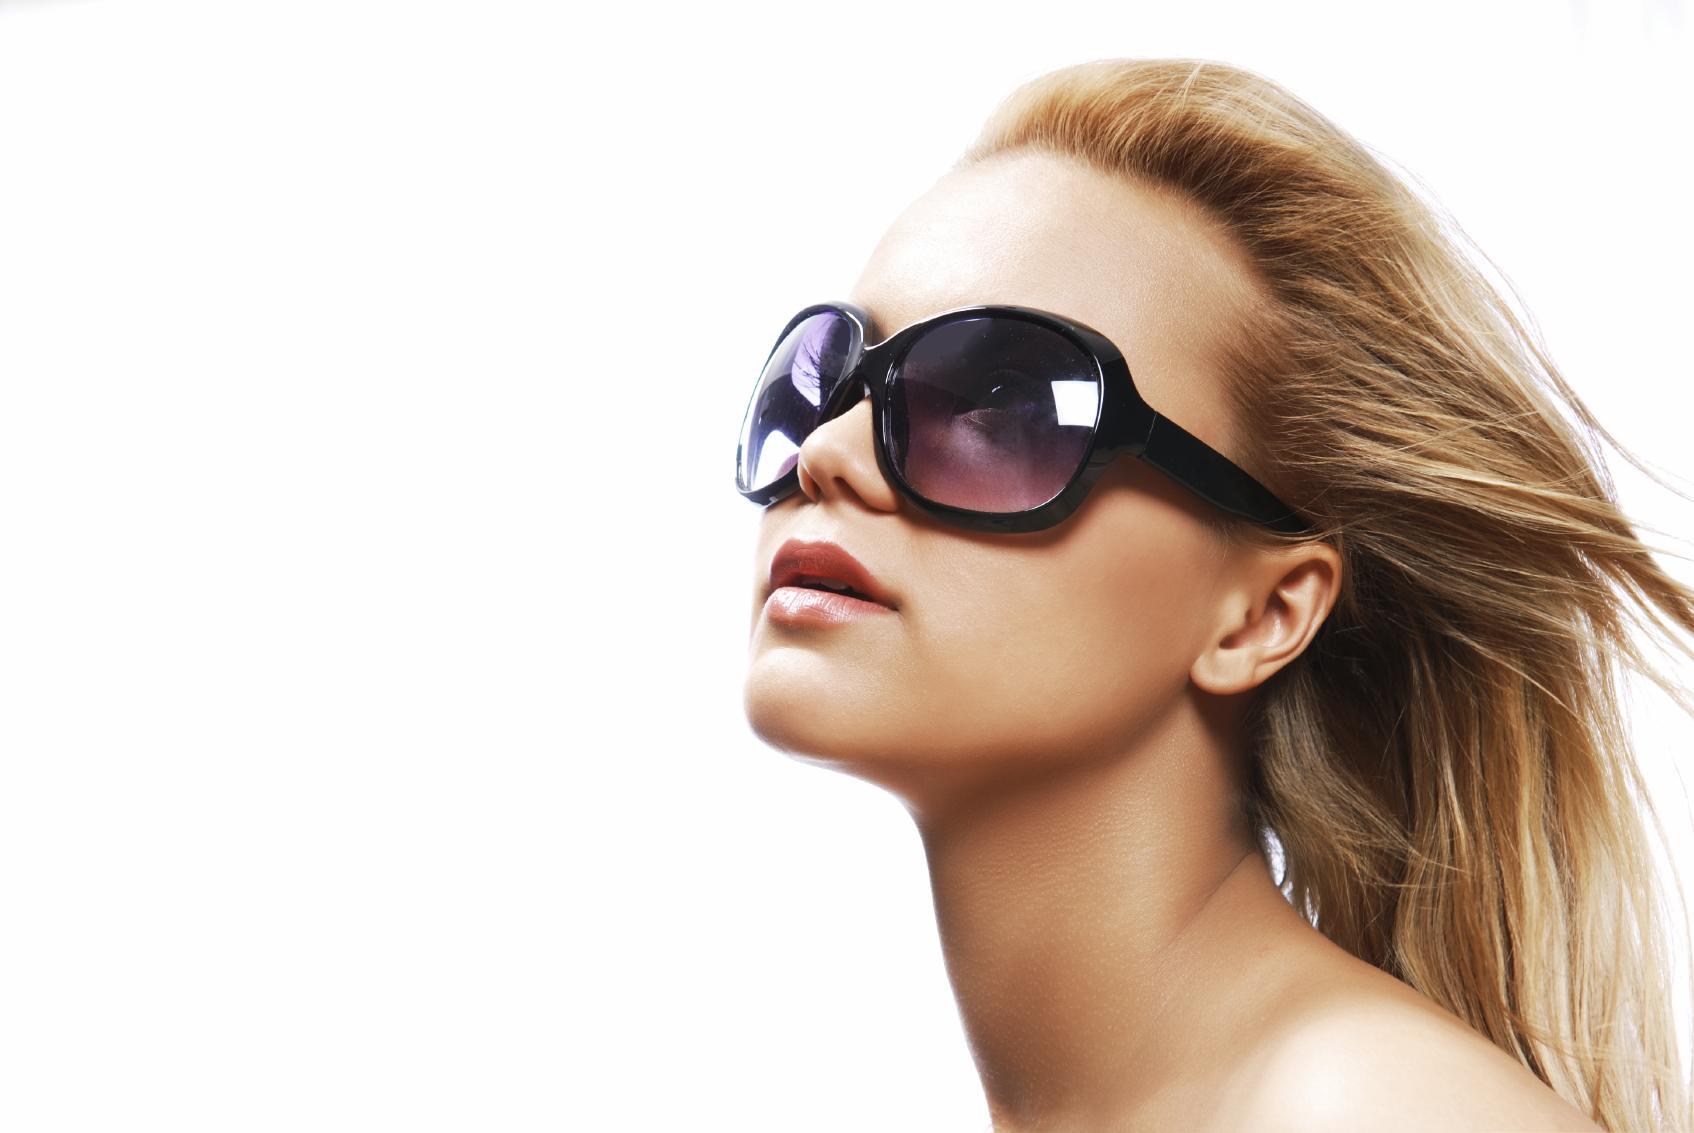 tendance lunette soleil femme 2016,lunette